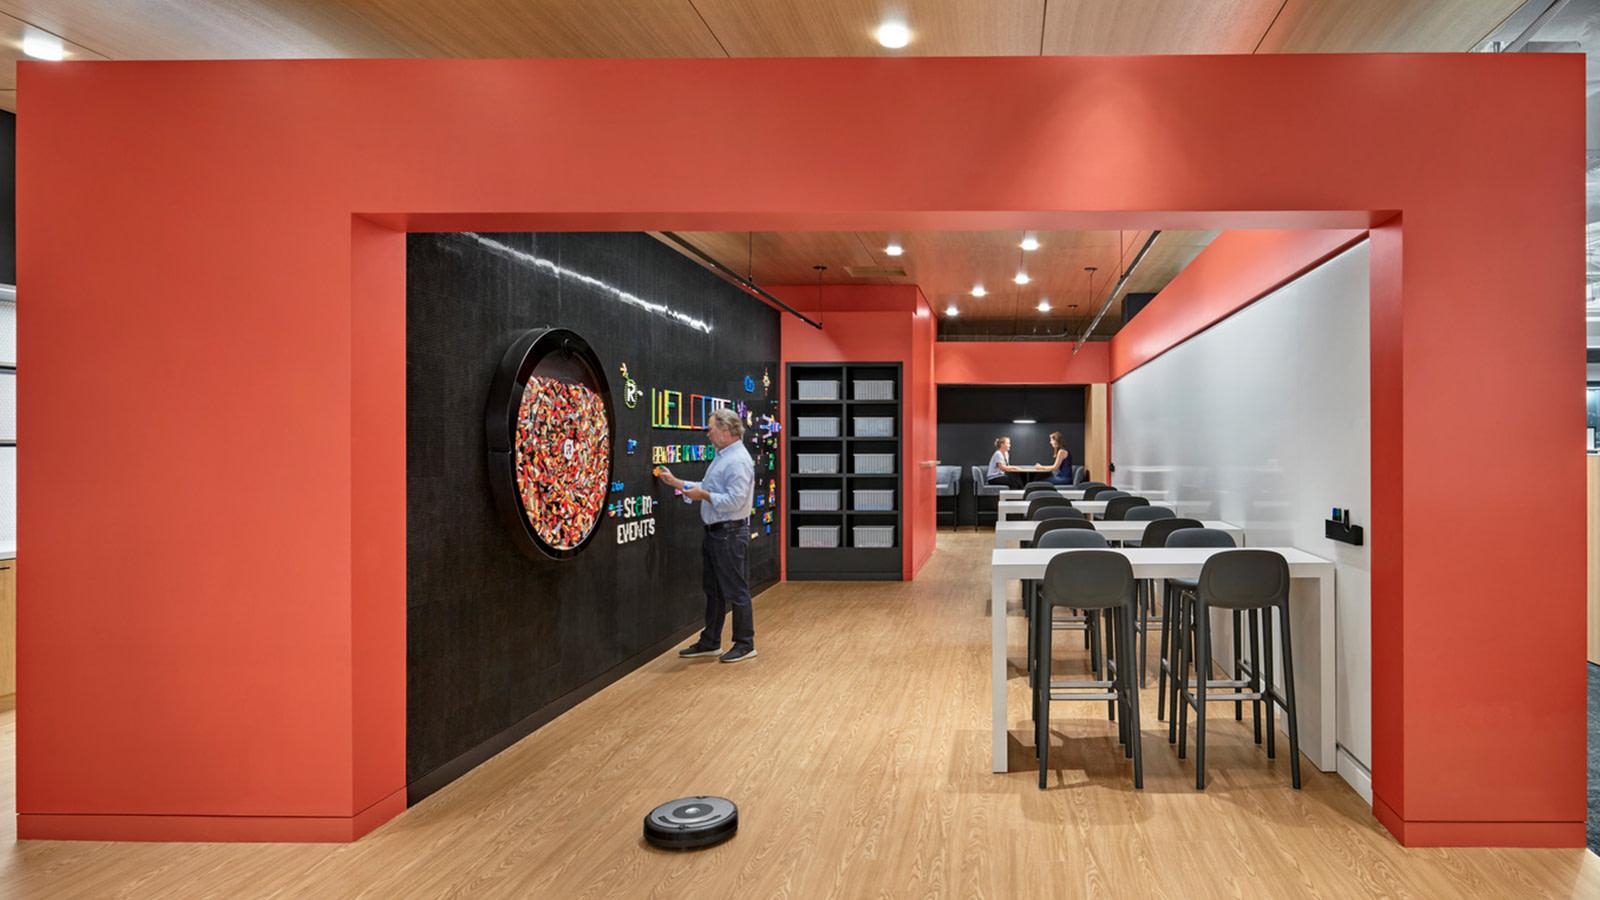 Interactive wall at iRobot's headquarters